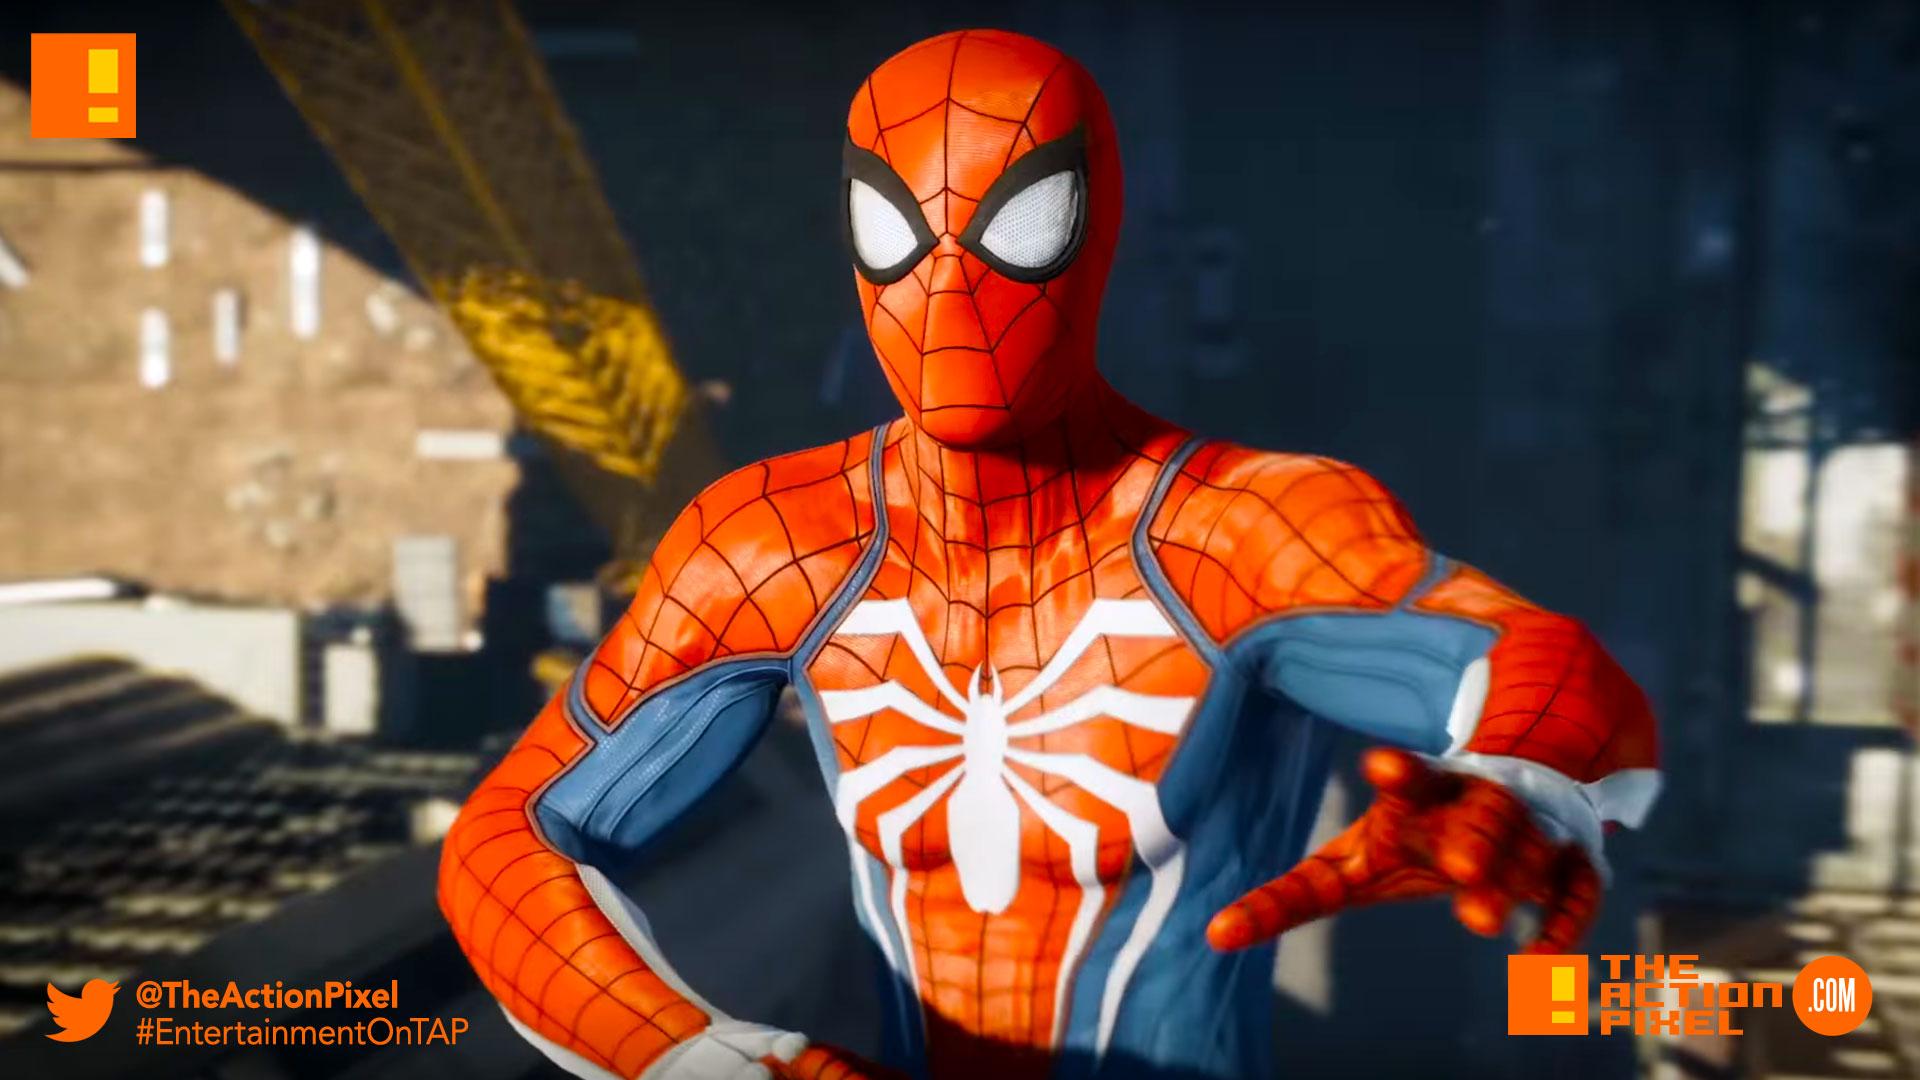 Wallpaper Spiderman Ps4 Hd